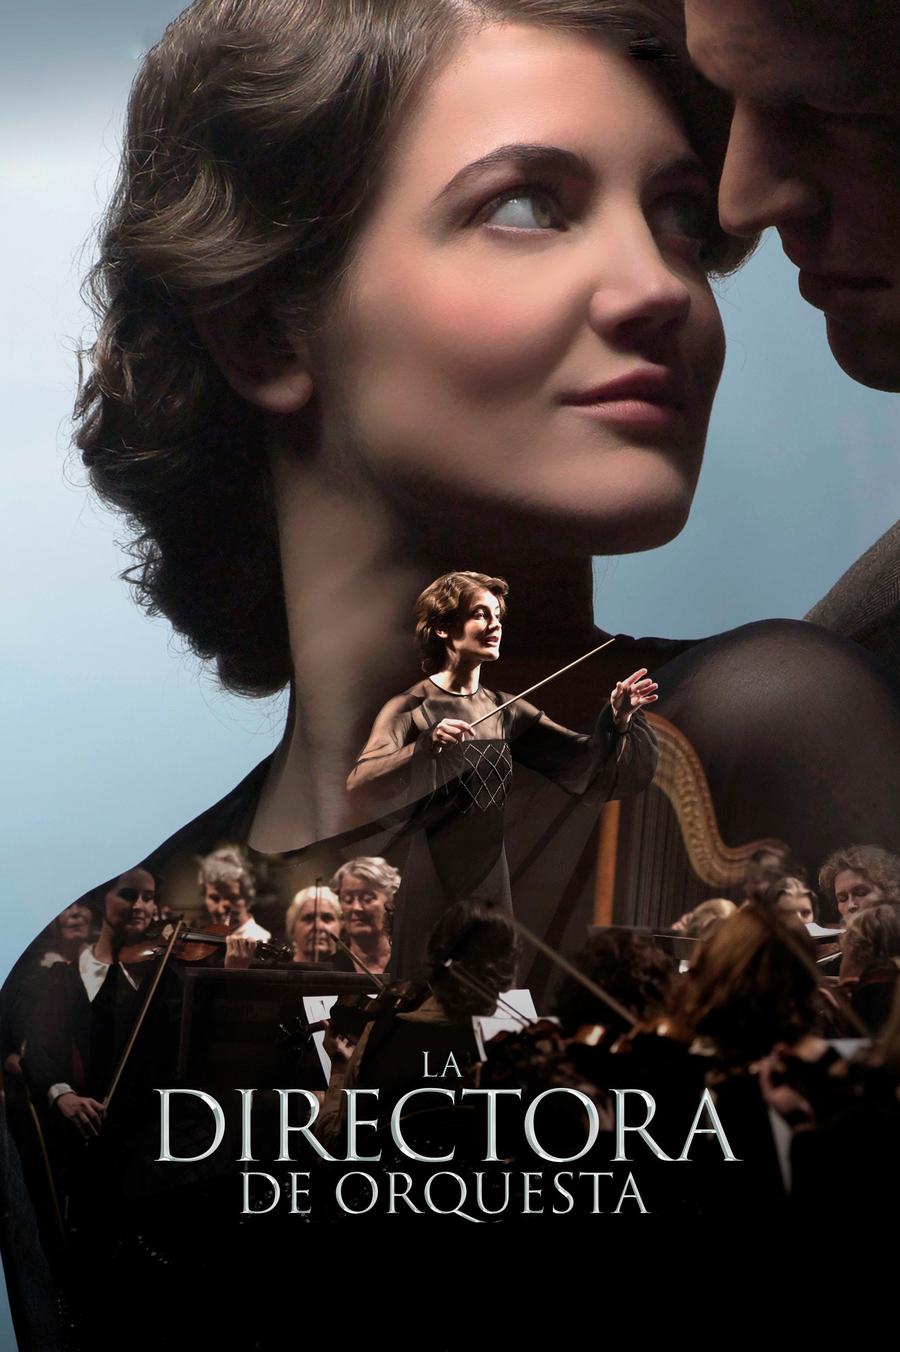 La directora de orquesta